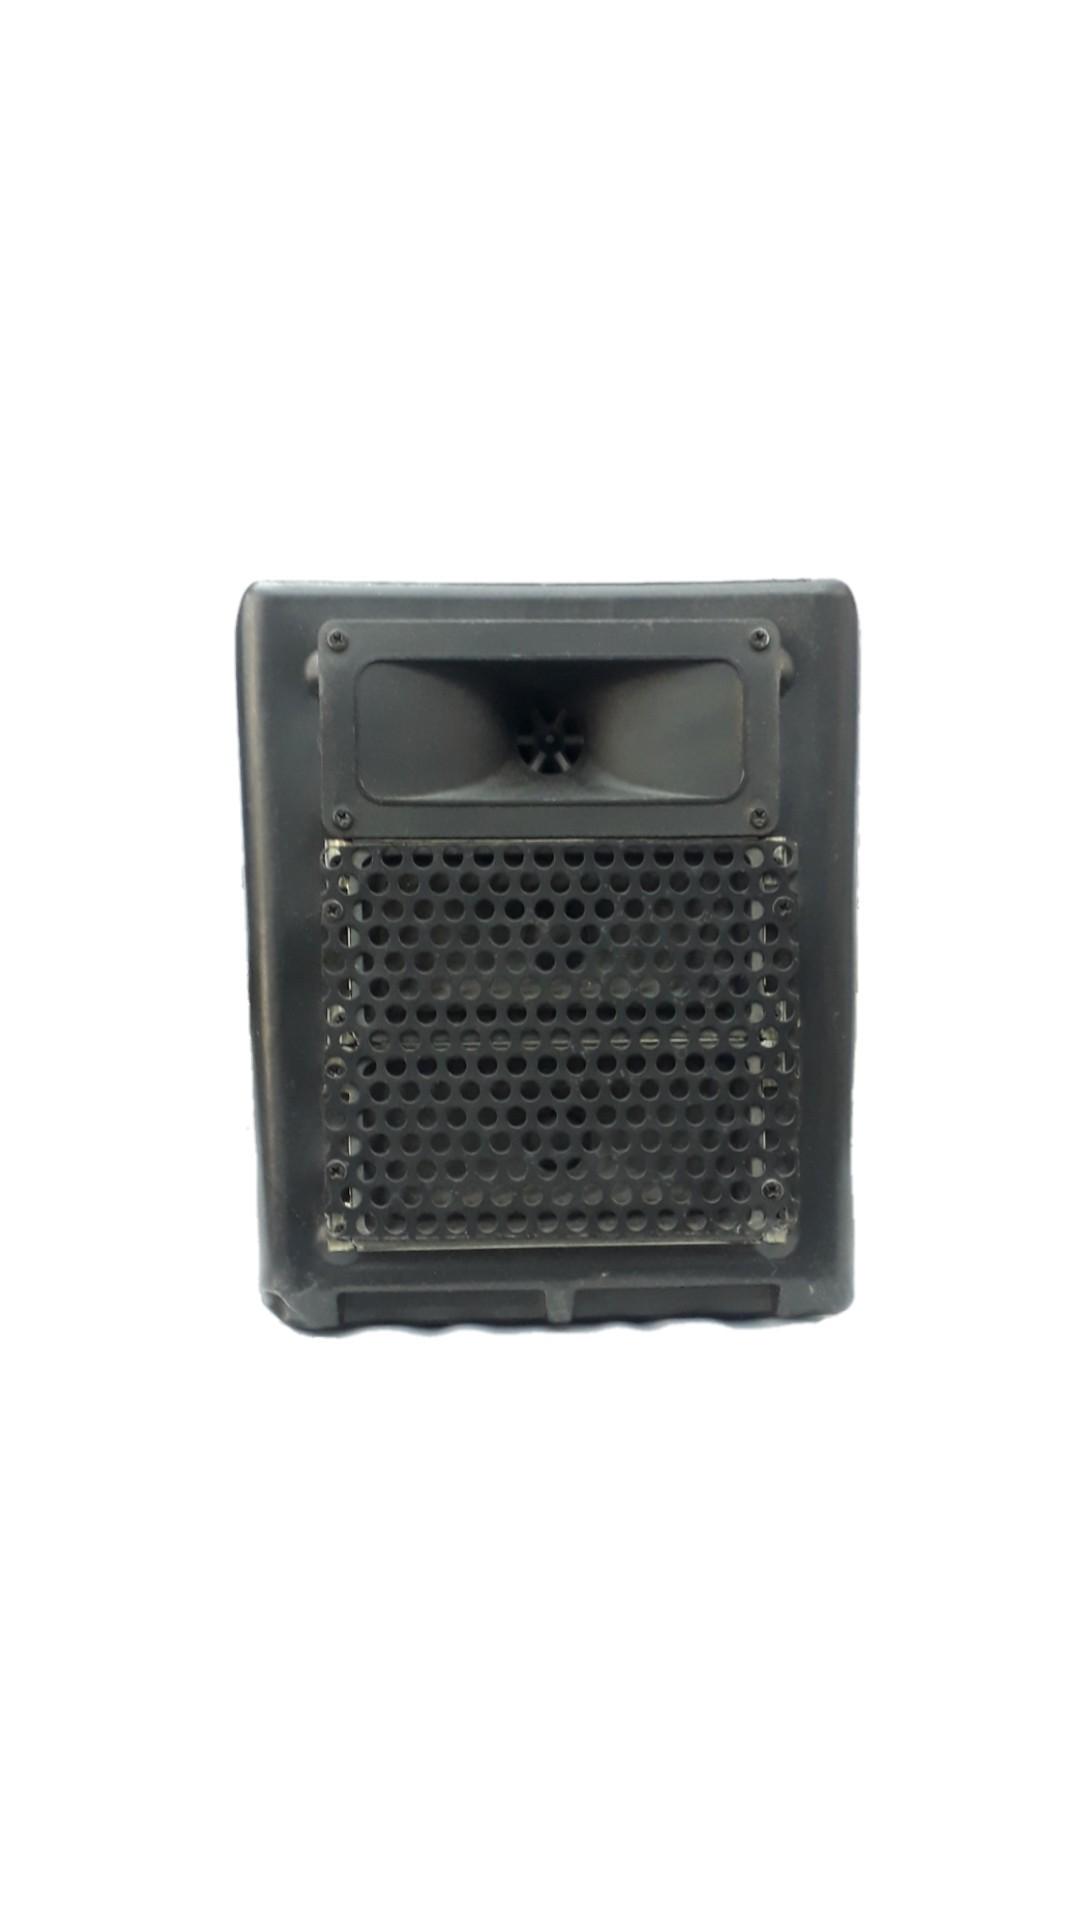 Caixa Amplificada Supertech Max Baby Usb/Sd/Fm,2fal 1tw, Auto Radio C/Fonte 05476,Ativa 180wrms